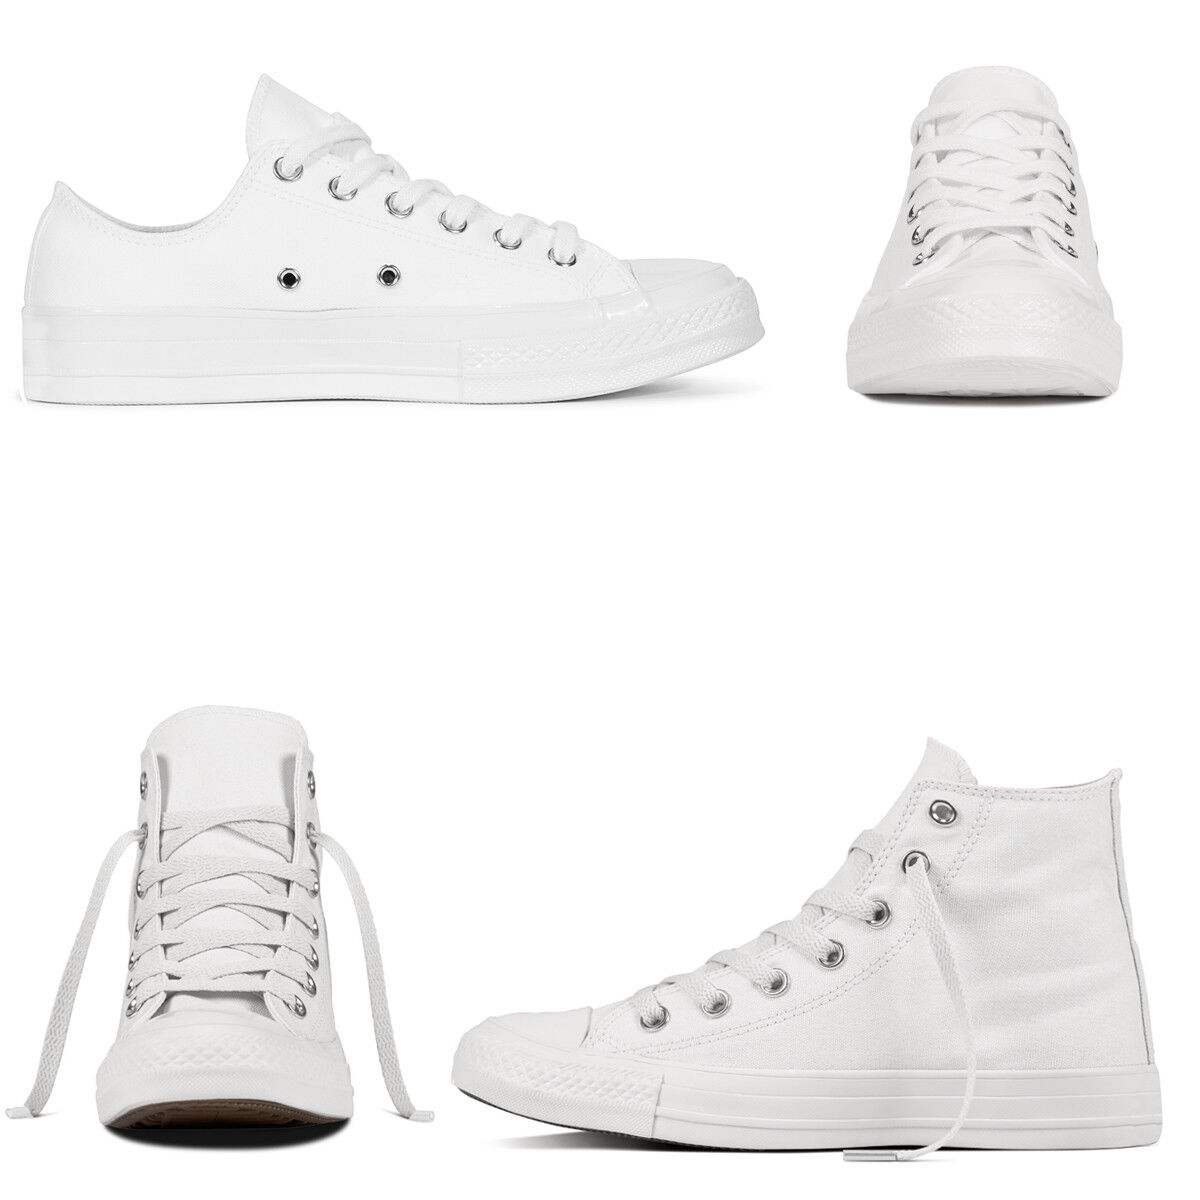 Scarpe Da Ginnastica Bianche Tela Uomo Donna Sneakers Alte Basse Casual Unisex